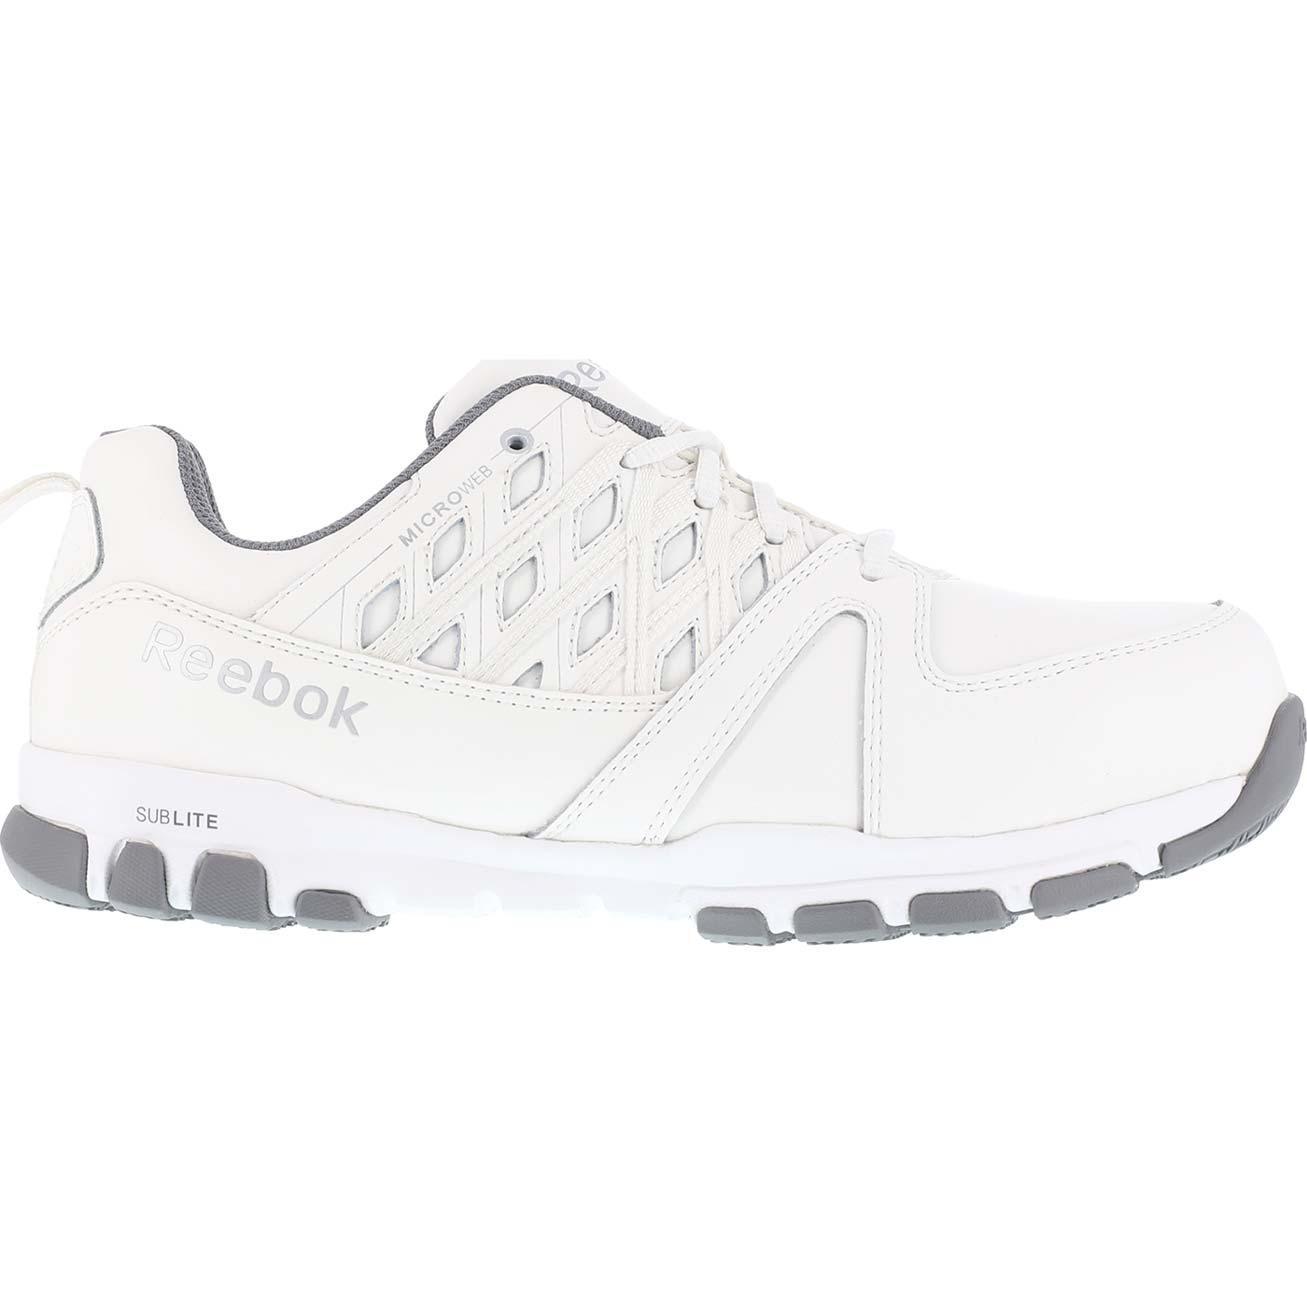 c995dbe96ba Images. Reebok Sublite Work Women s Steel Toe Static-Dissipative Work  Athletic Shoe ...